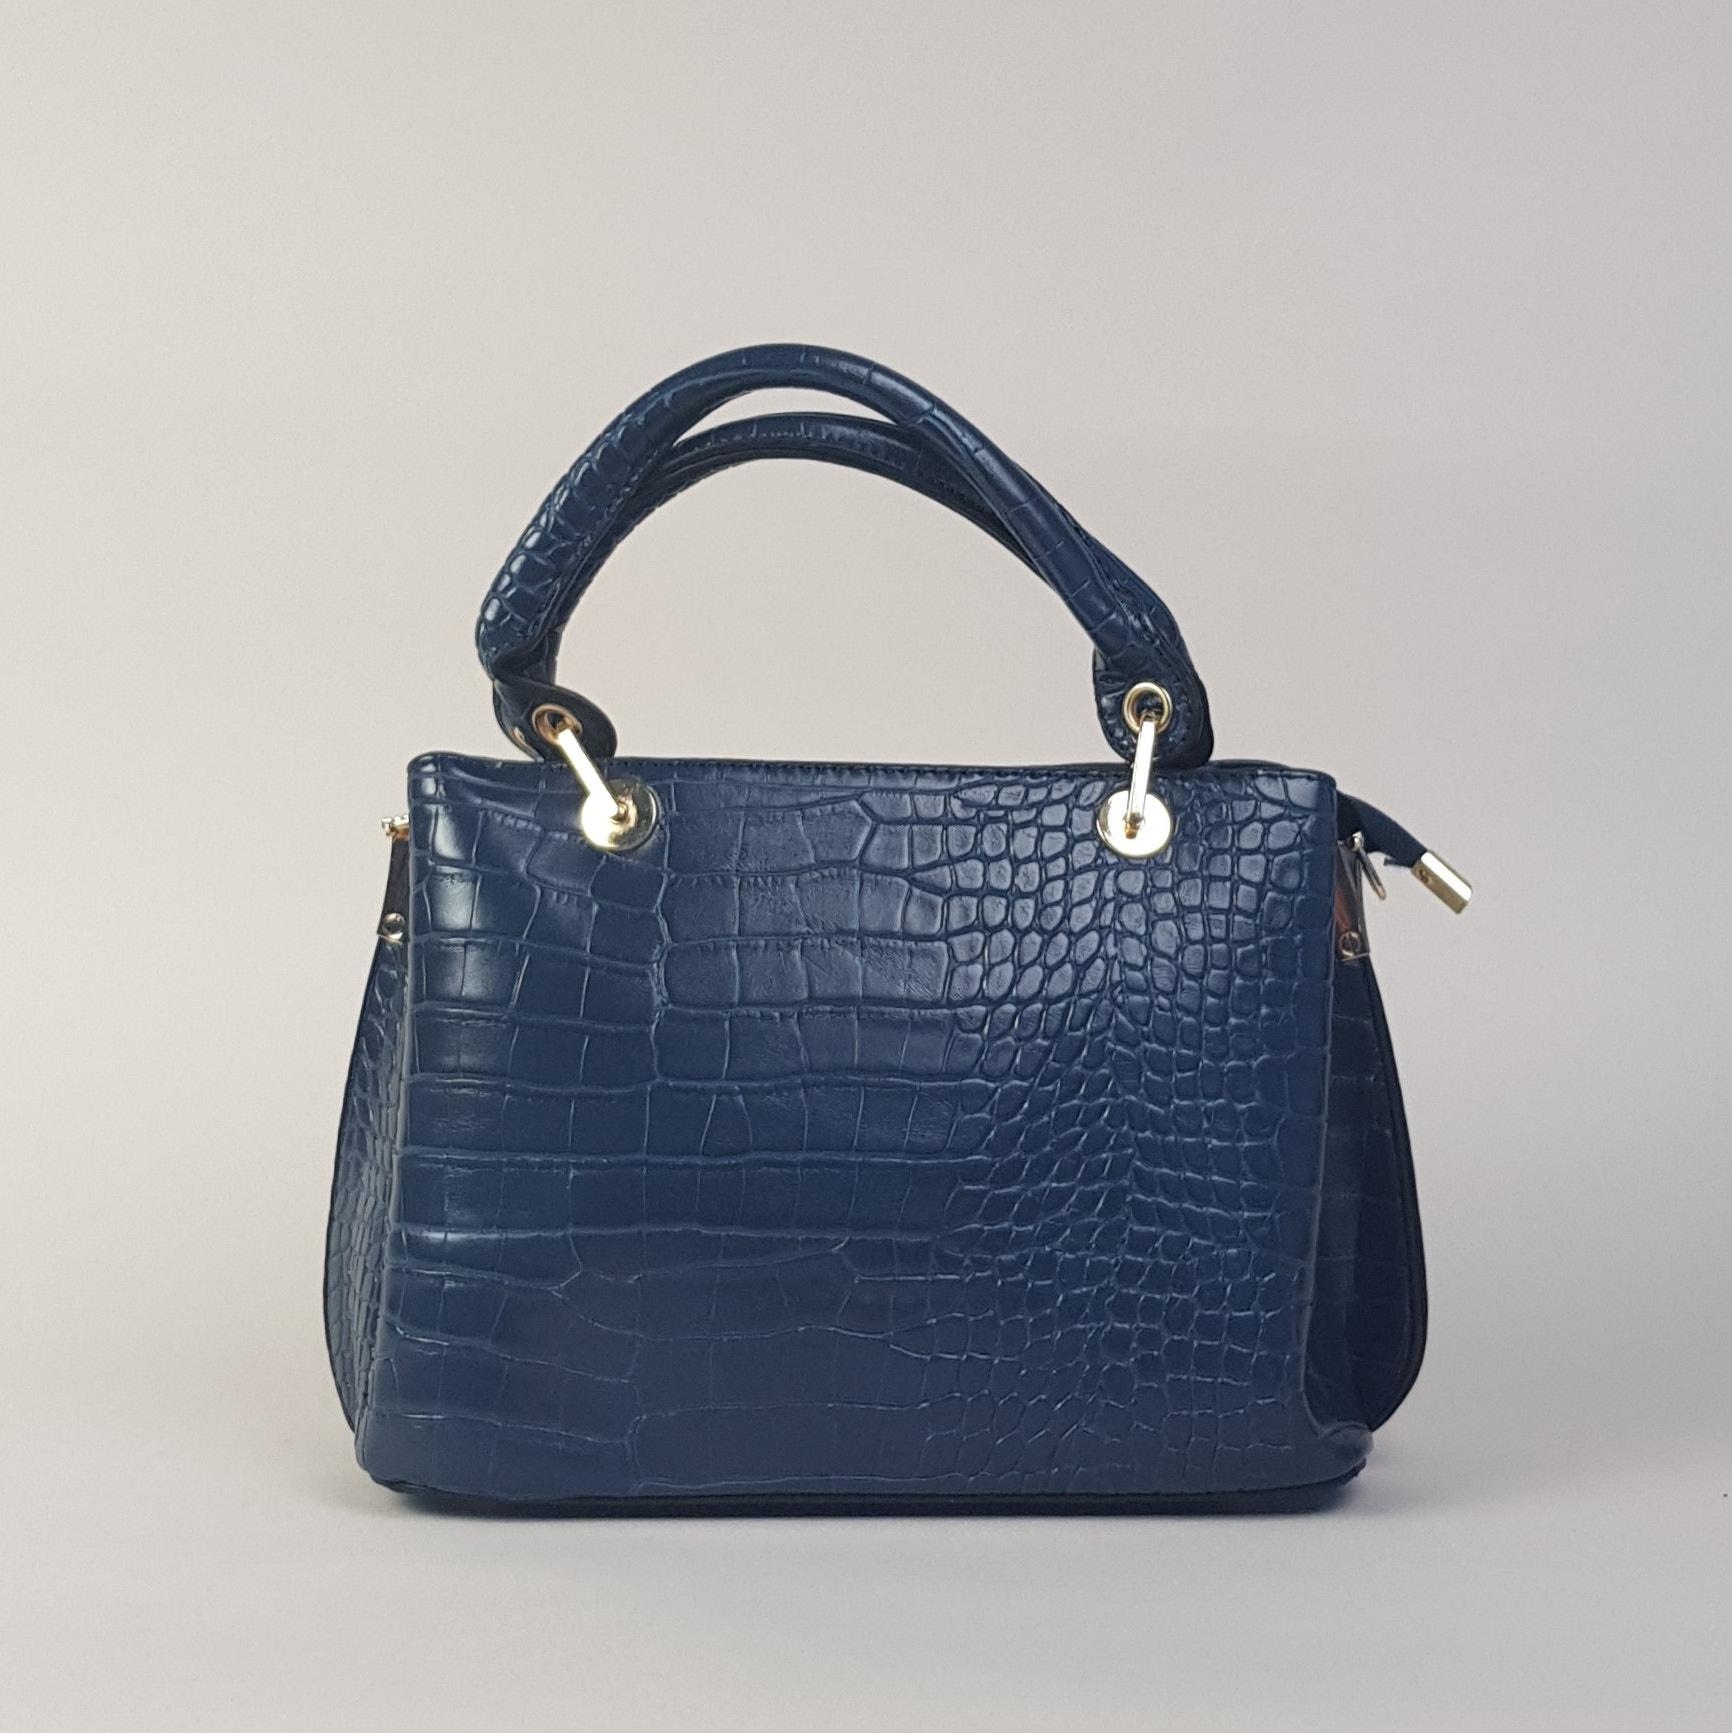 968-1# Blauw